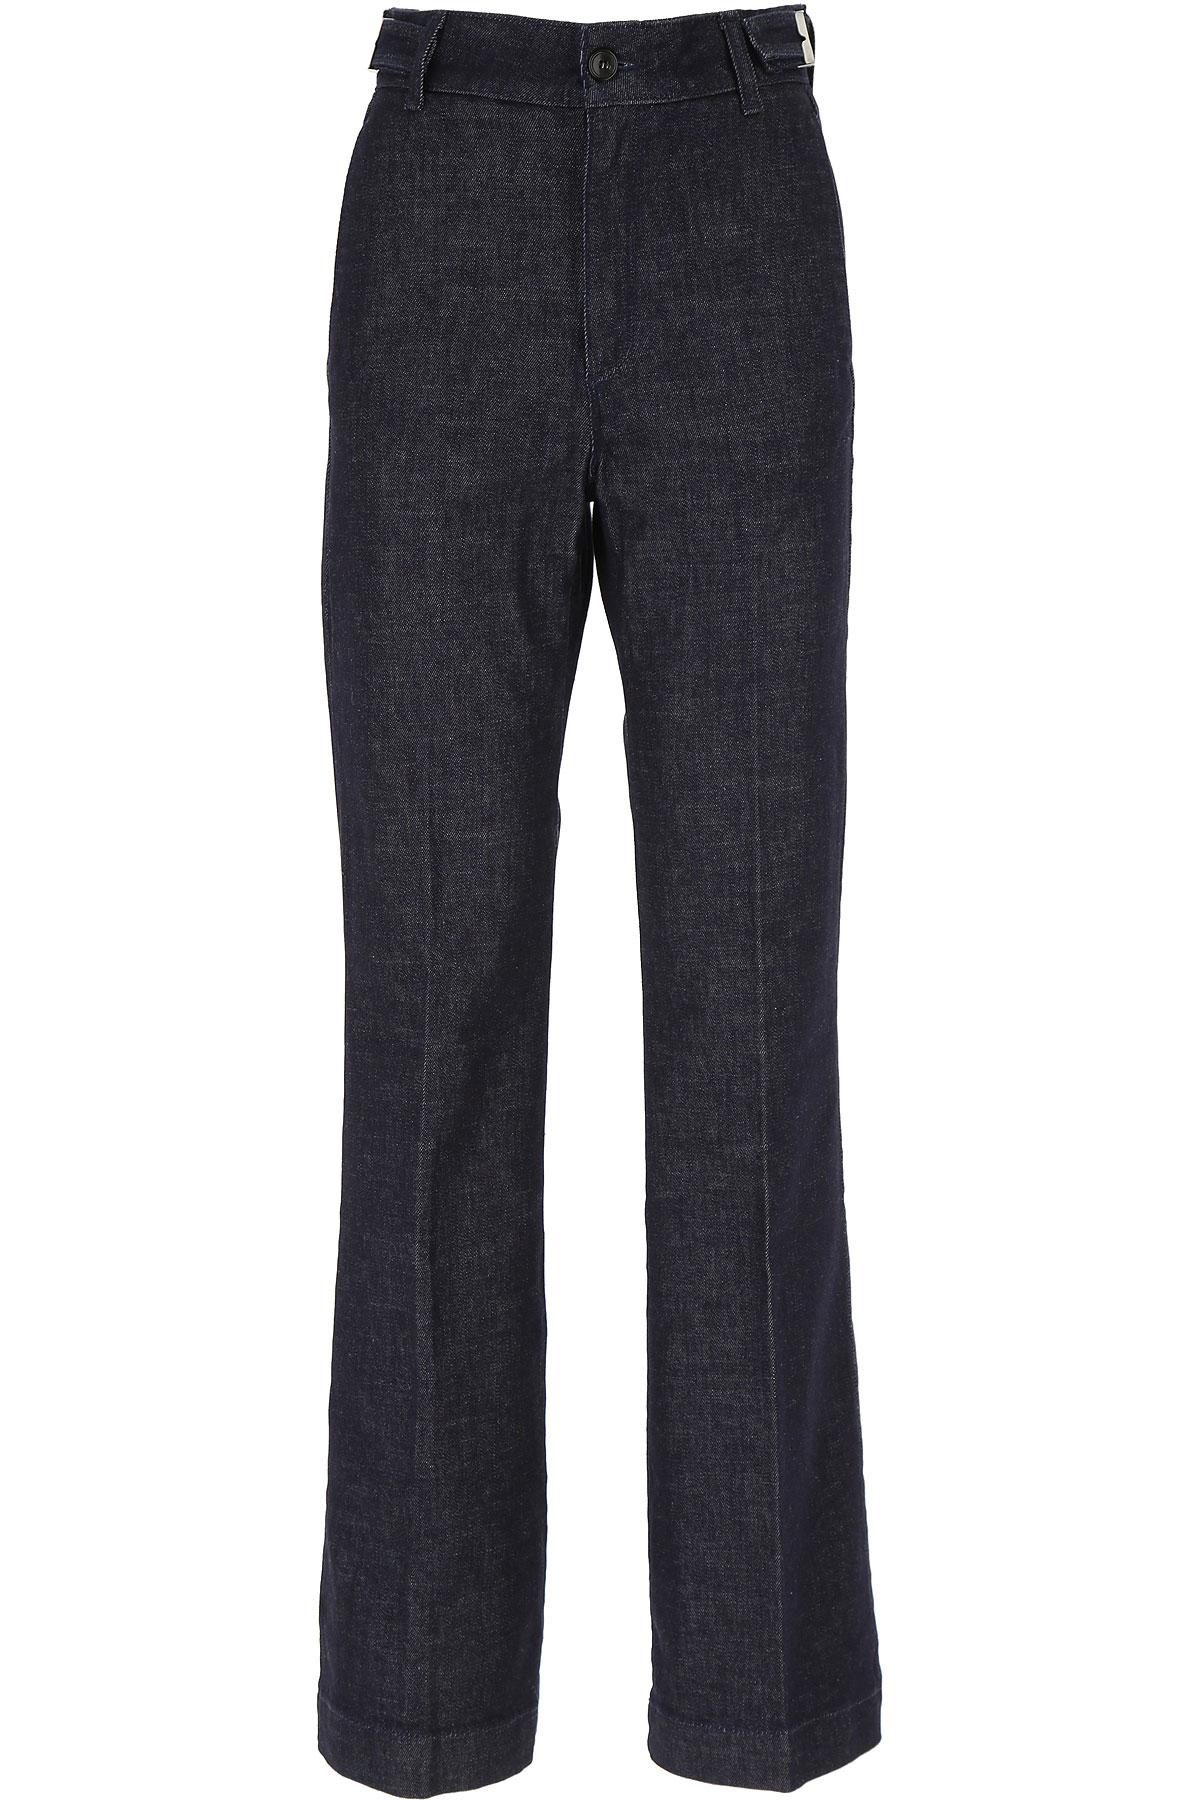 Department Five Jeans, Dark Blue Navy, Cotton, 2019, 26 27 29 30